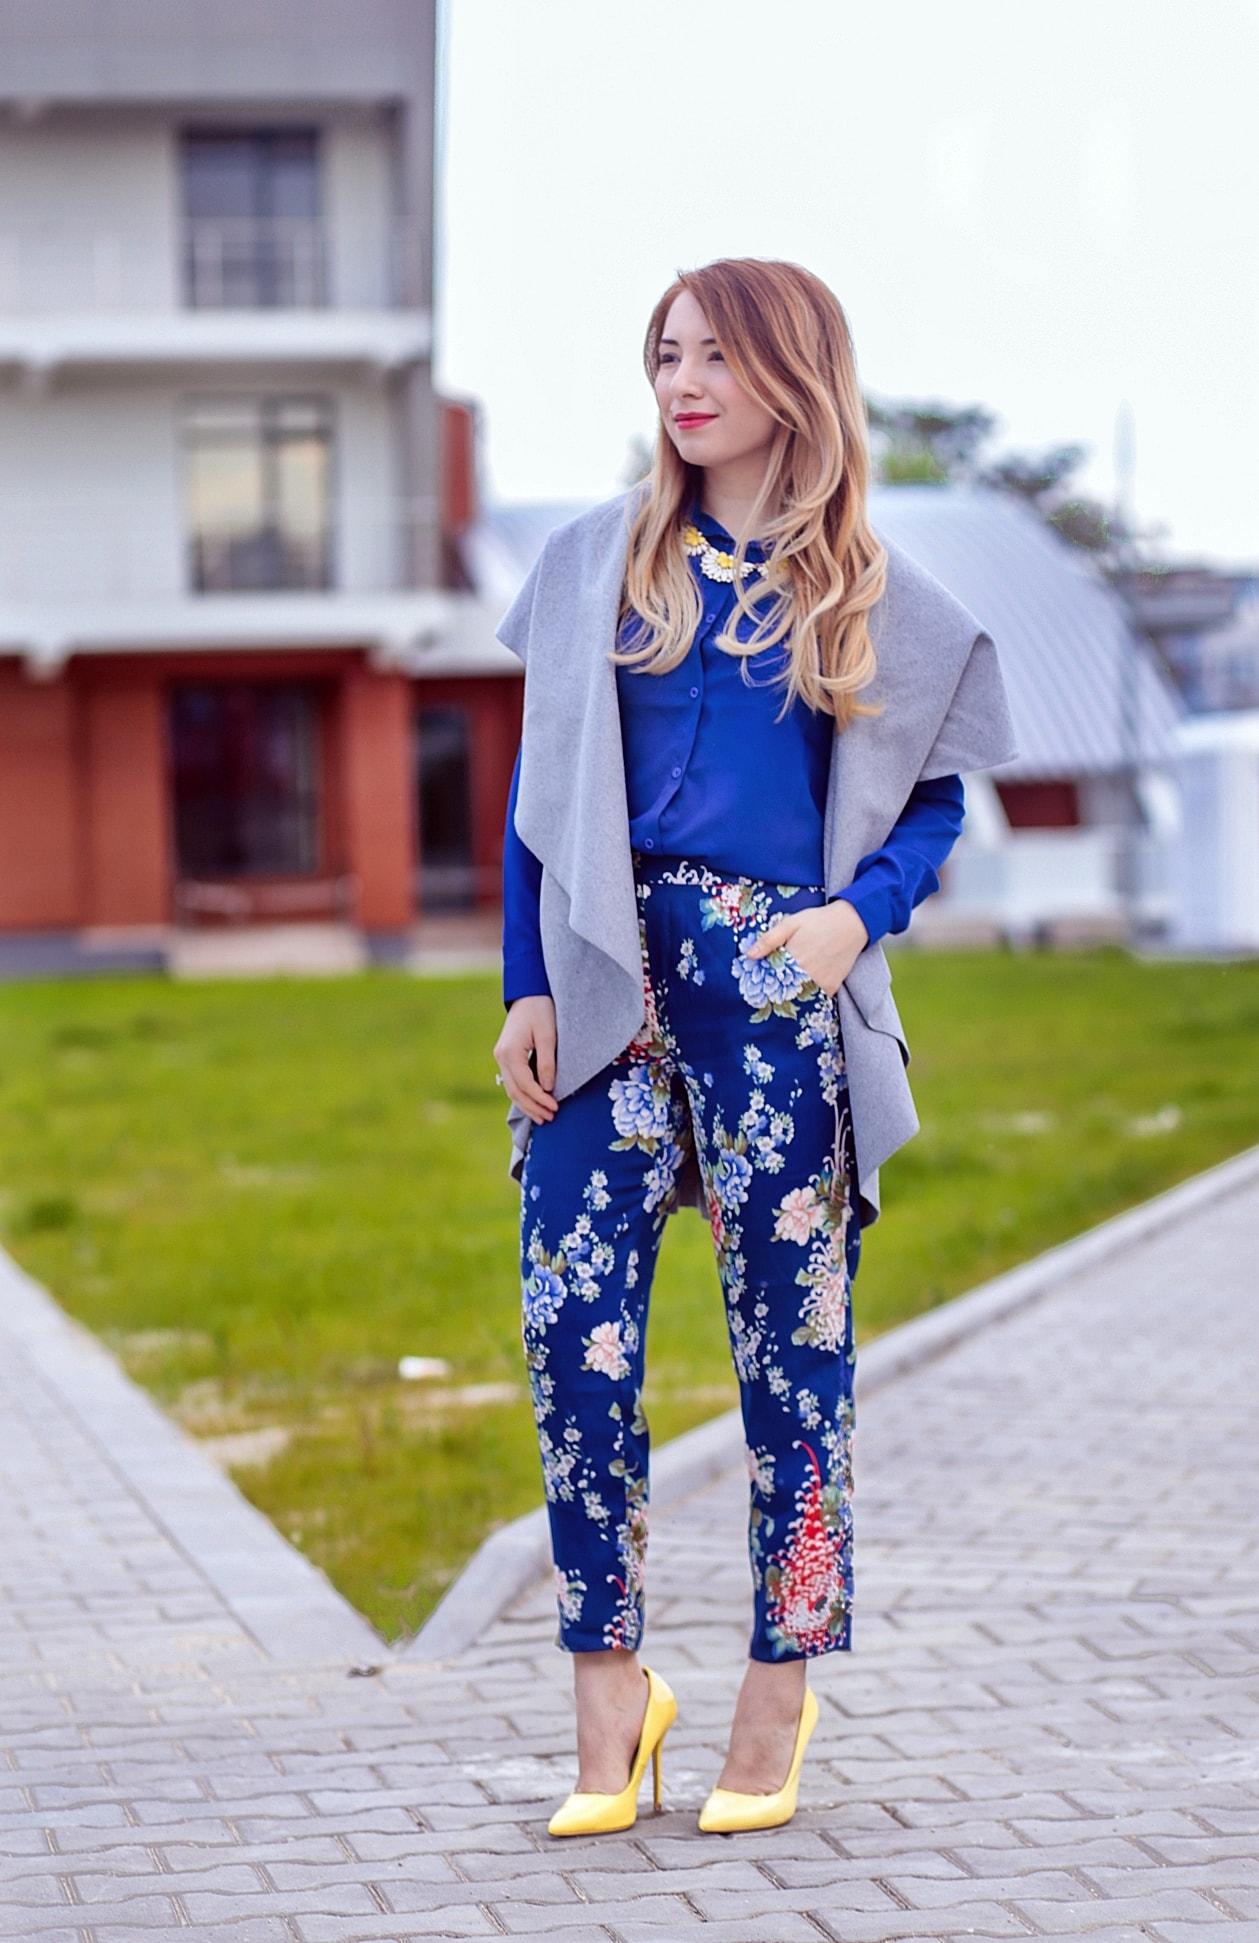 Street style, floral print pants, blue pants, blue shirt, grey oversized vest, romwe, yellow shoes, stiletto, heels, andreea ristea, fashion, blogger